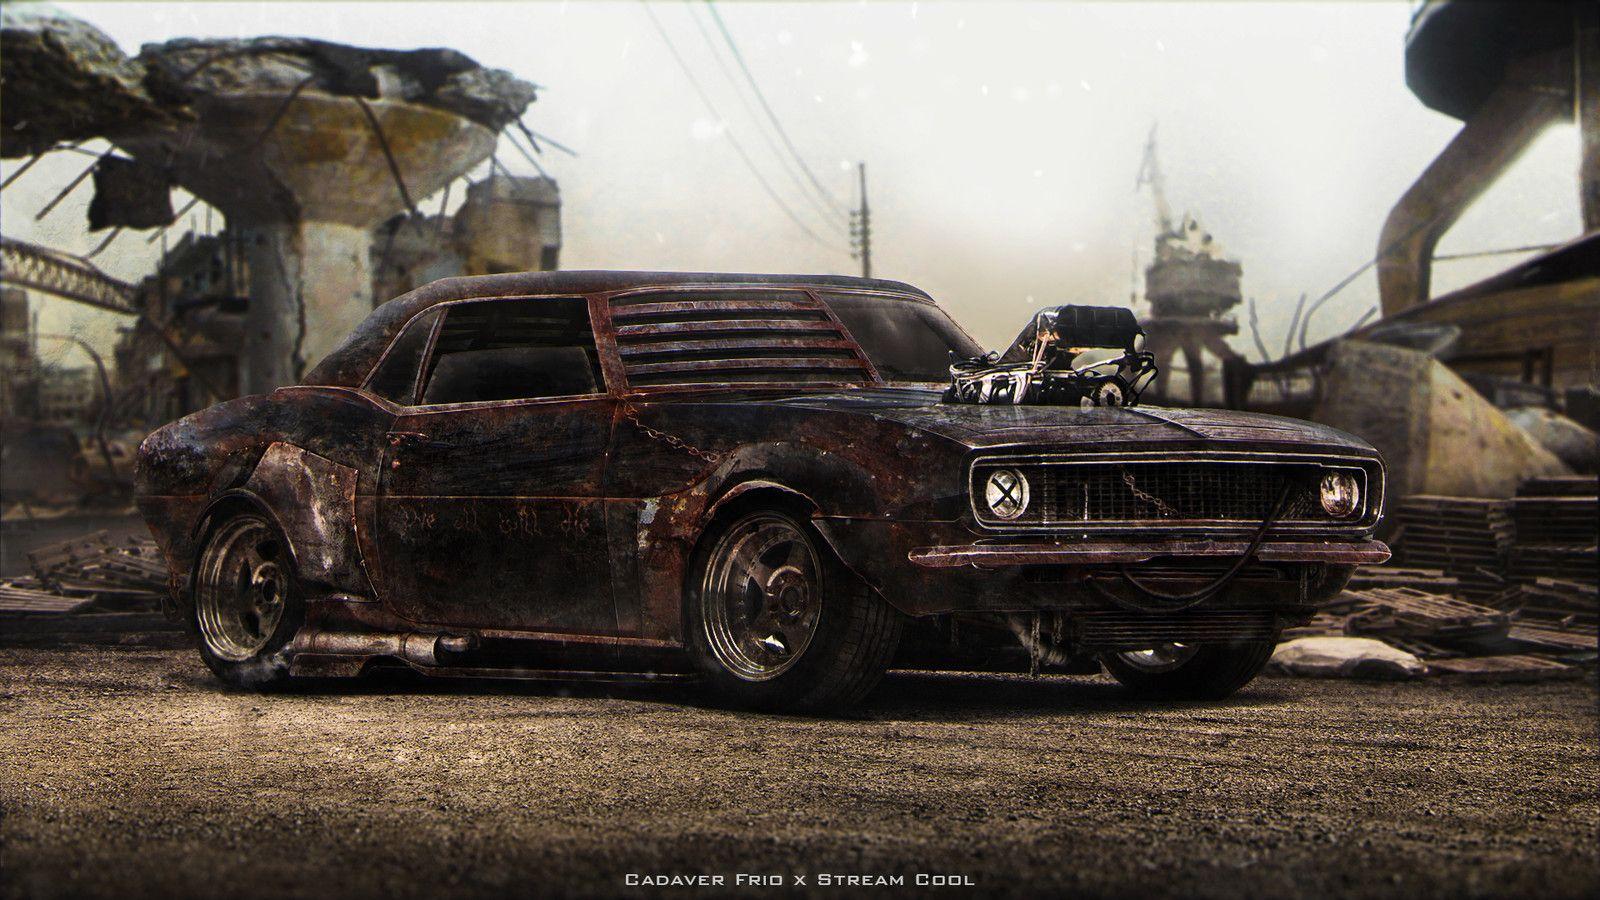 Pin By Maksim Sytnikov On Zombie Apocalypse Vehicle Pinterest